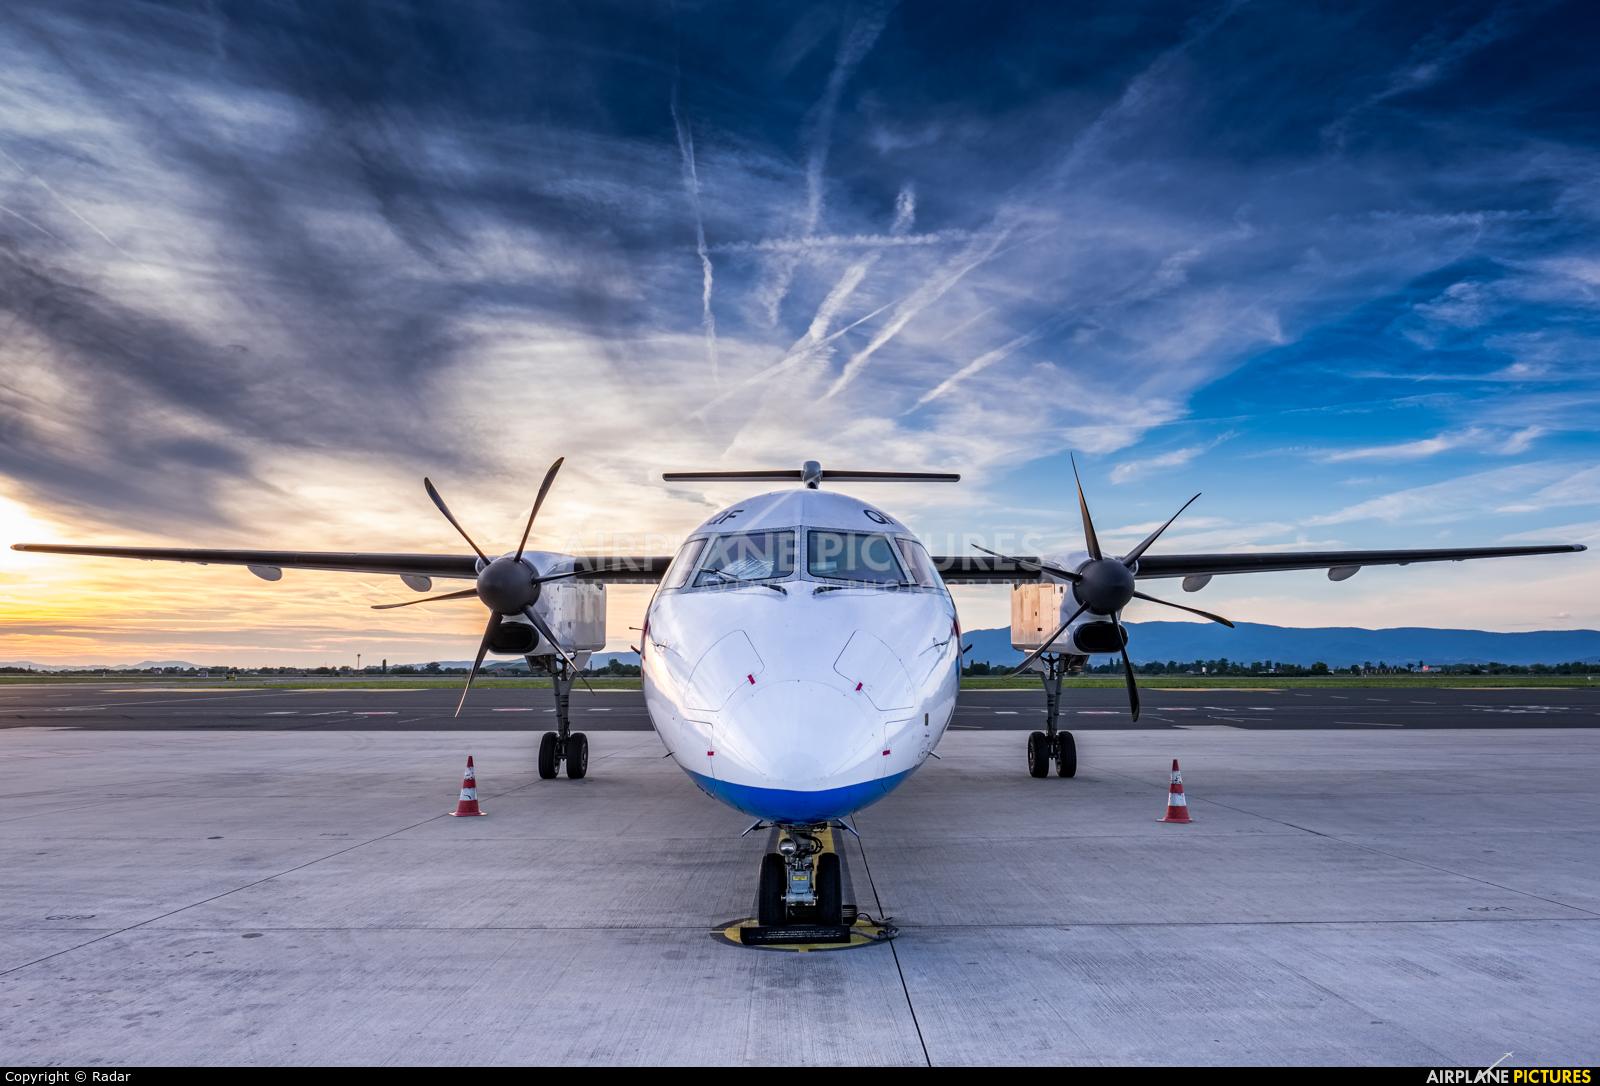 Croatia Airlines 9A-CQF aircraft at Zagreb